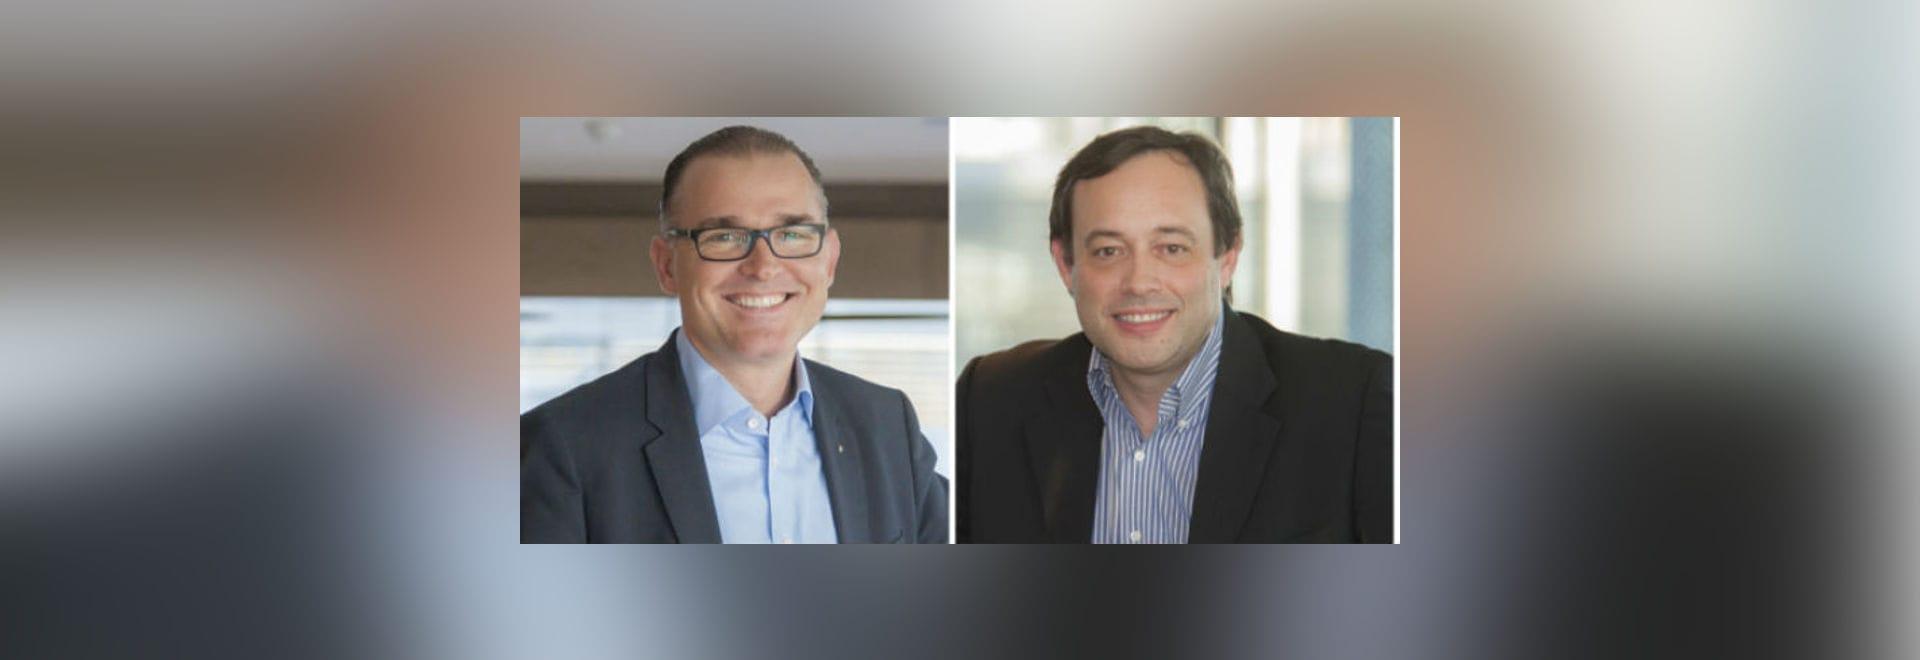 Dos ex-Sonova empleados ensamblan al Comité Ejecutivo de Sivantos